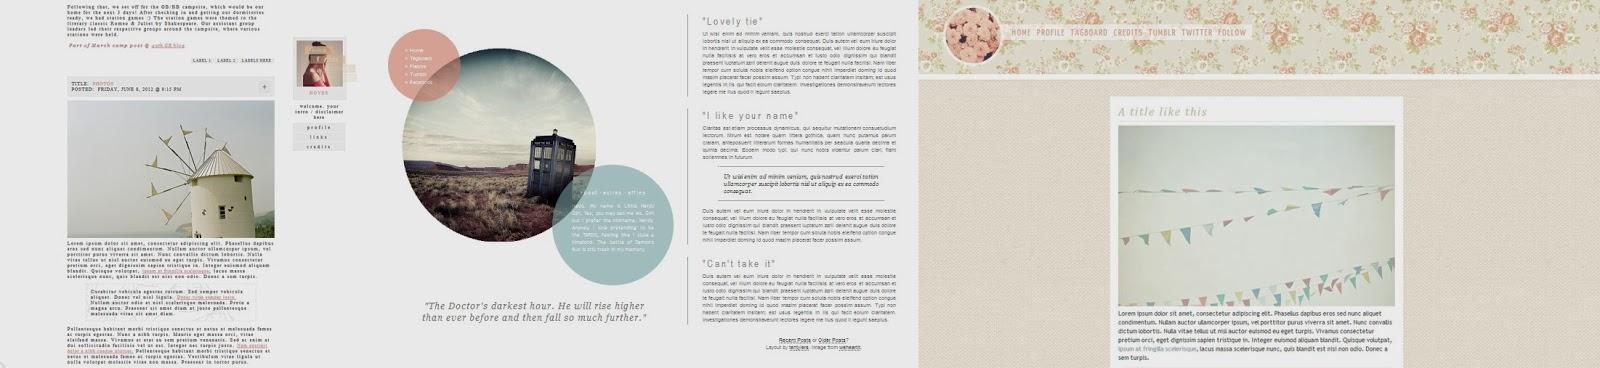 herzzurueckgarantie : Schönes Blog-Design?! - So geht\'s!